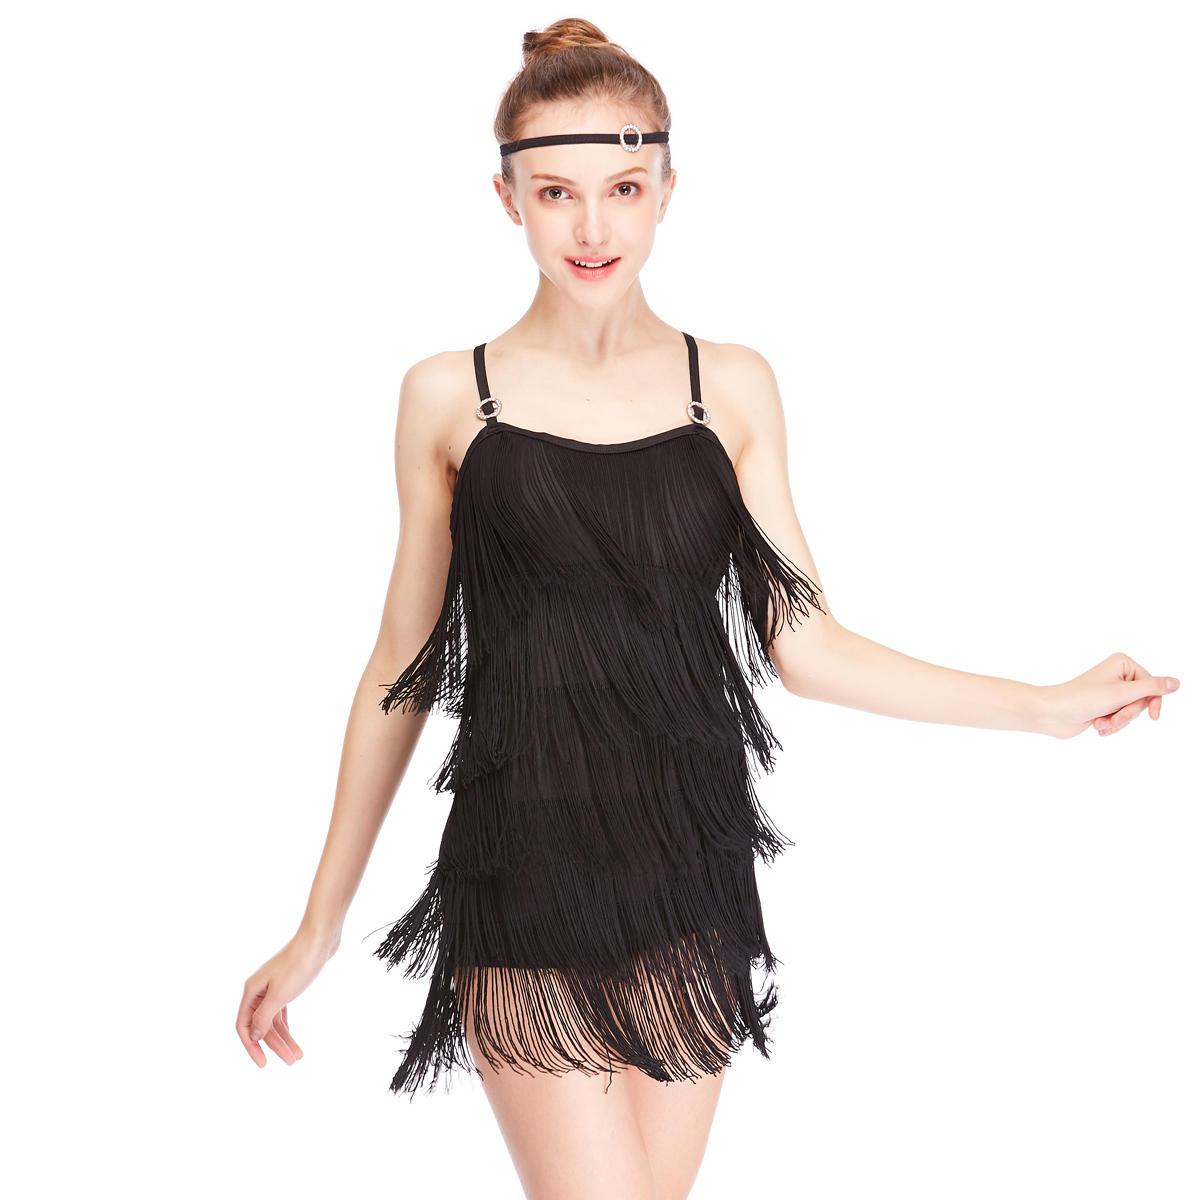 MiDee Jazz Fringe Camisole Dance Dress For Latin Salsa Rumba Dance Dress